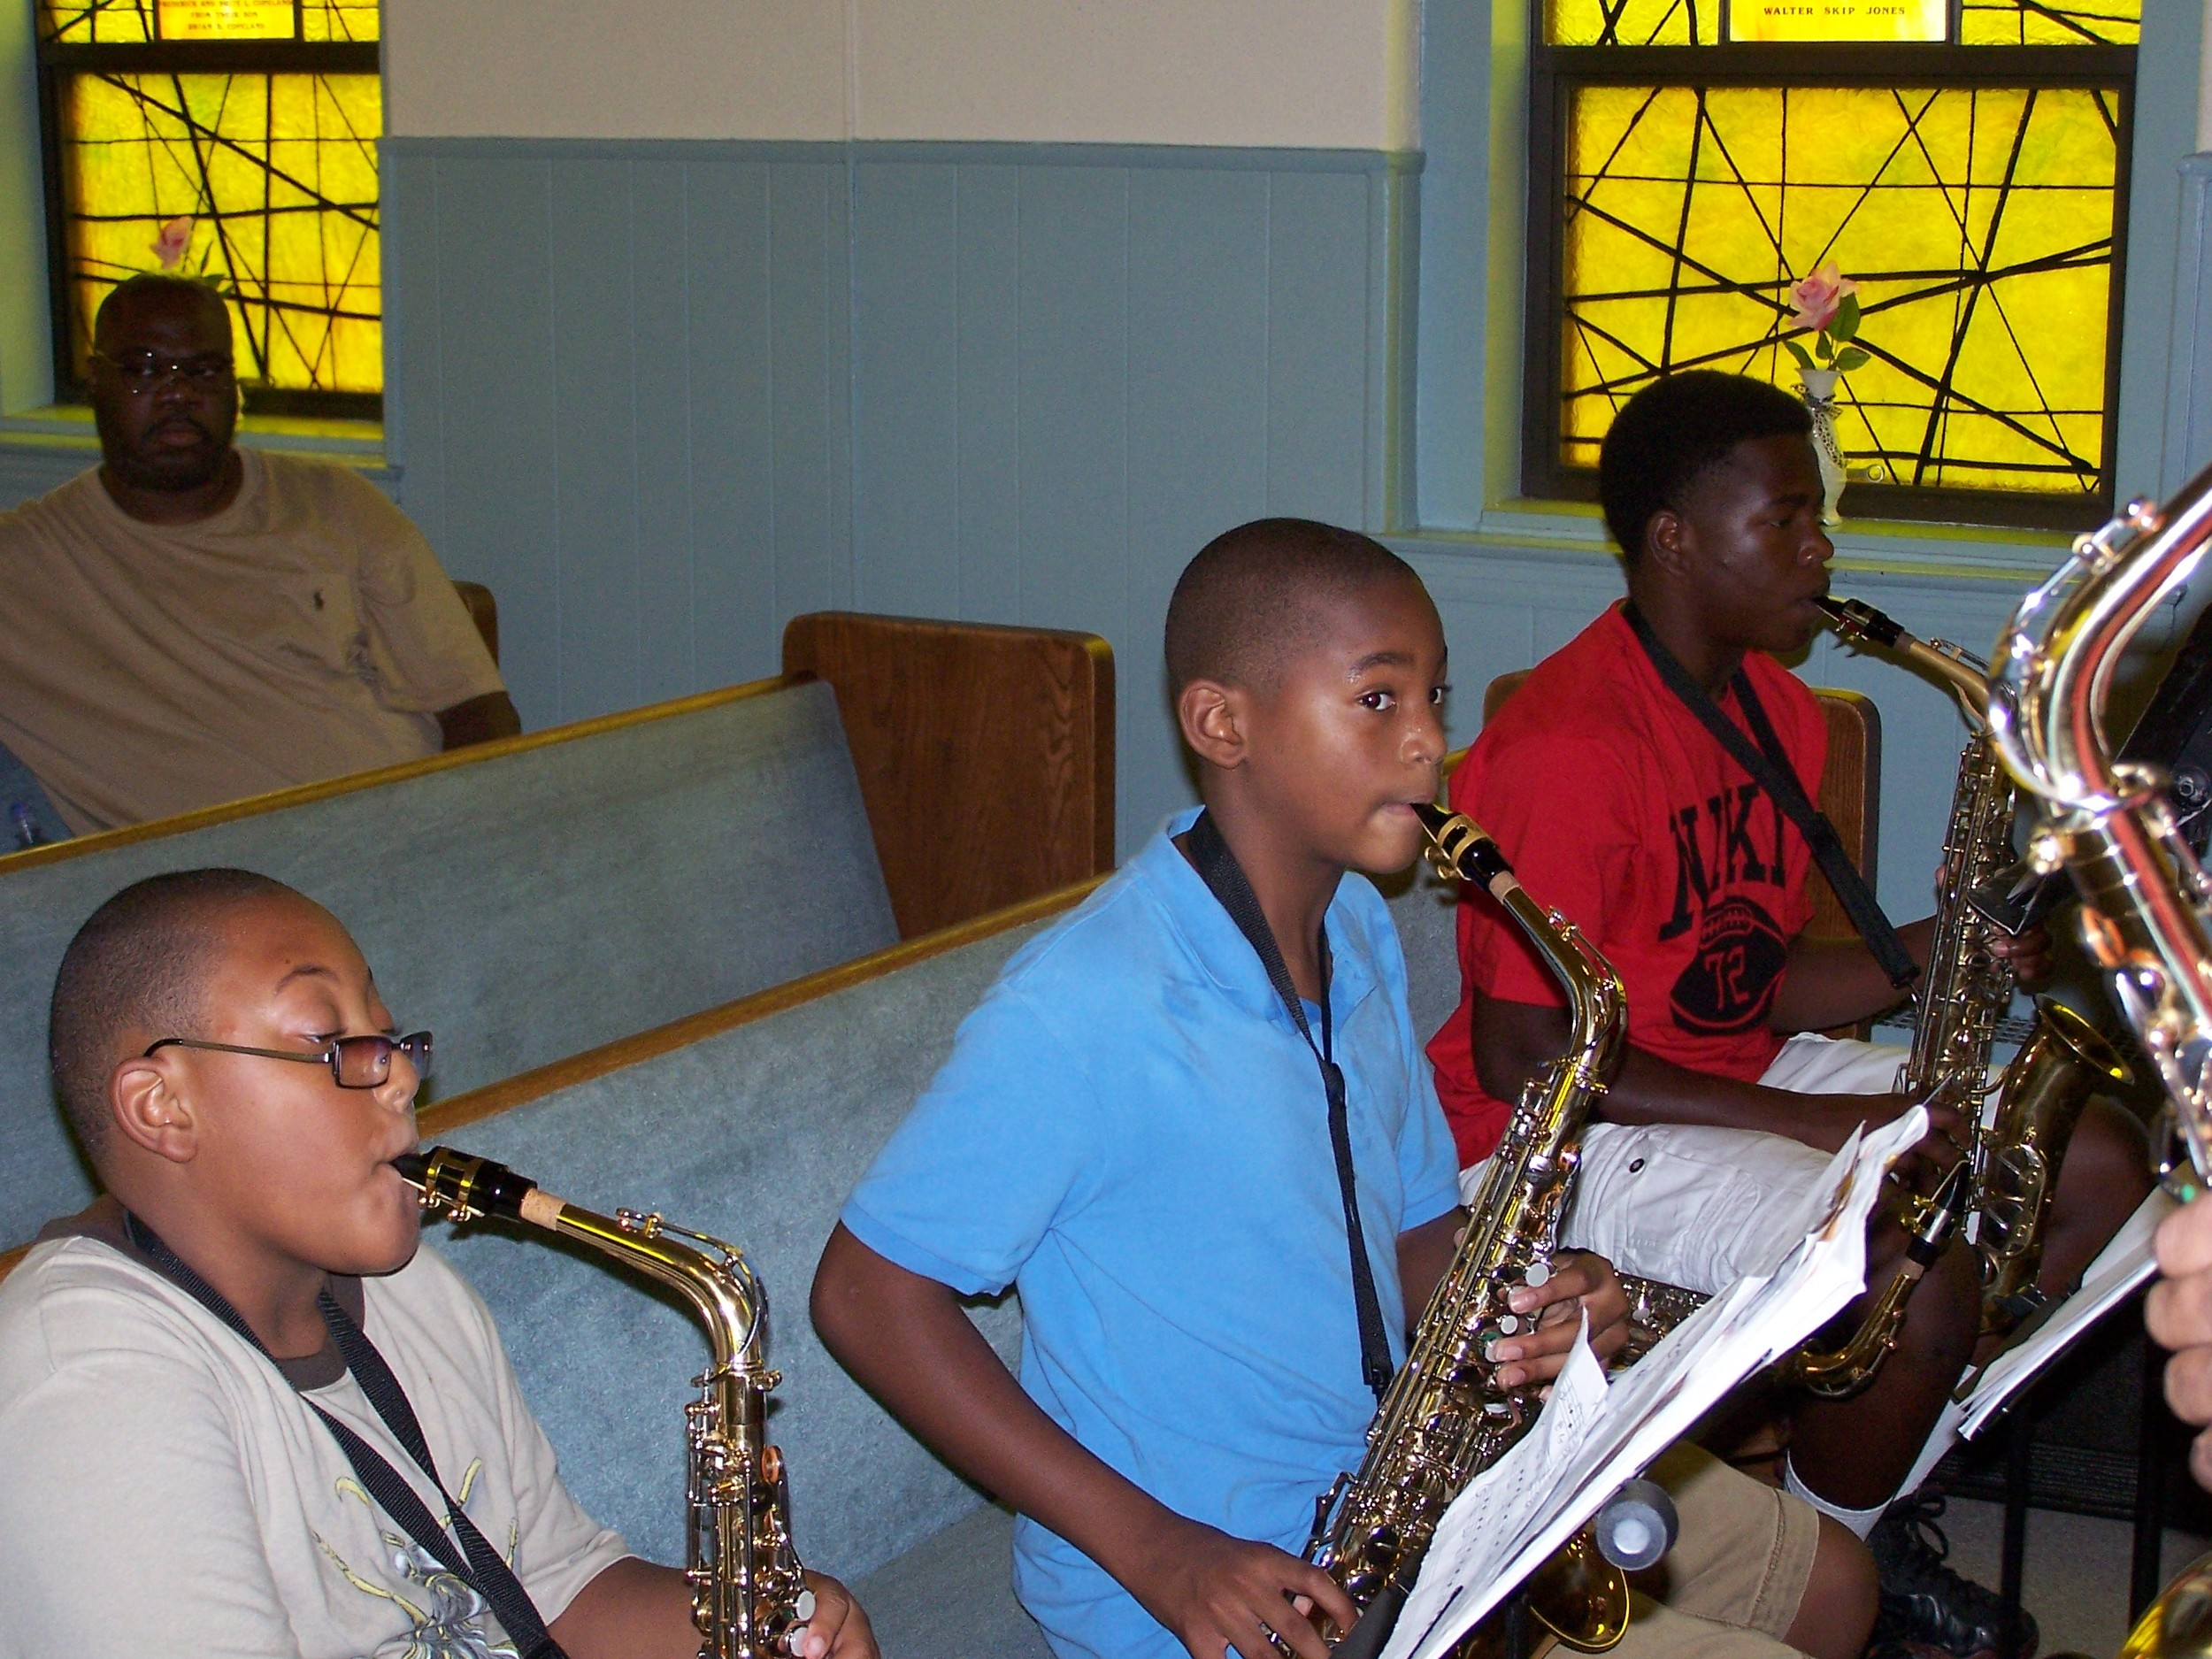 Jazz Ensemble Concert S2012 172.jpg